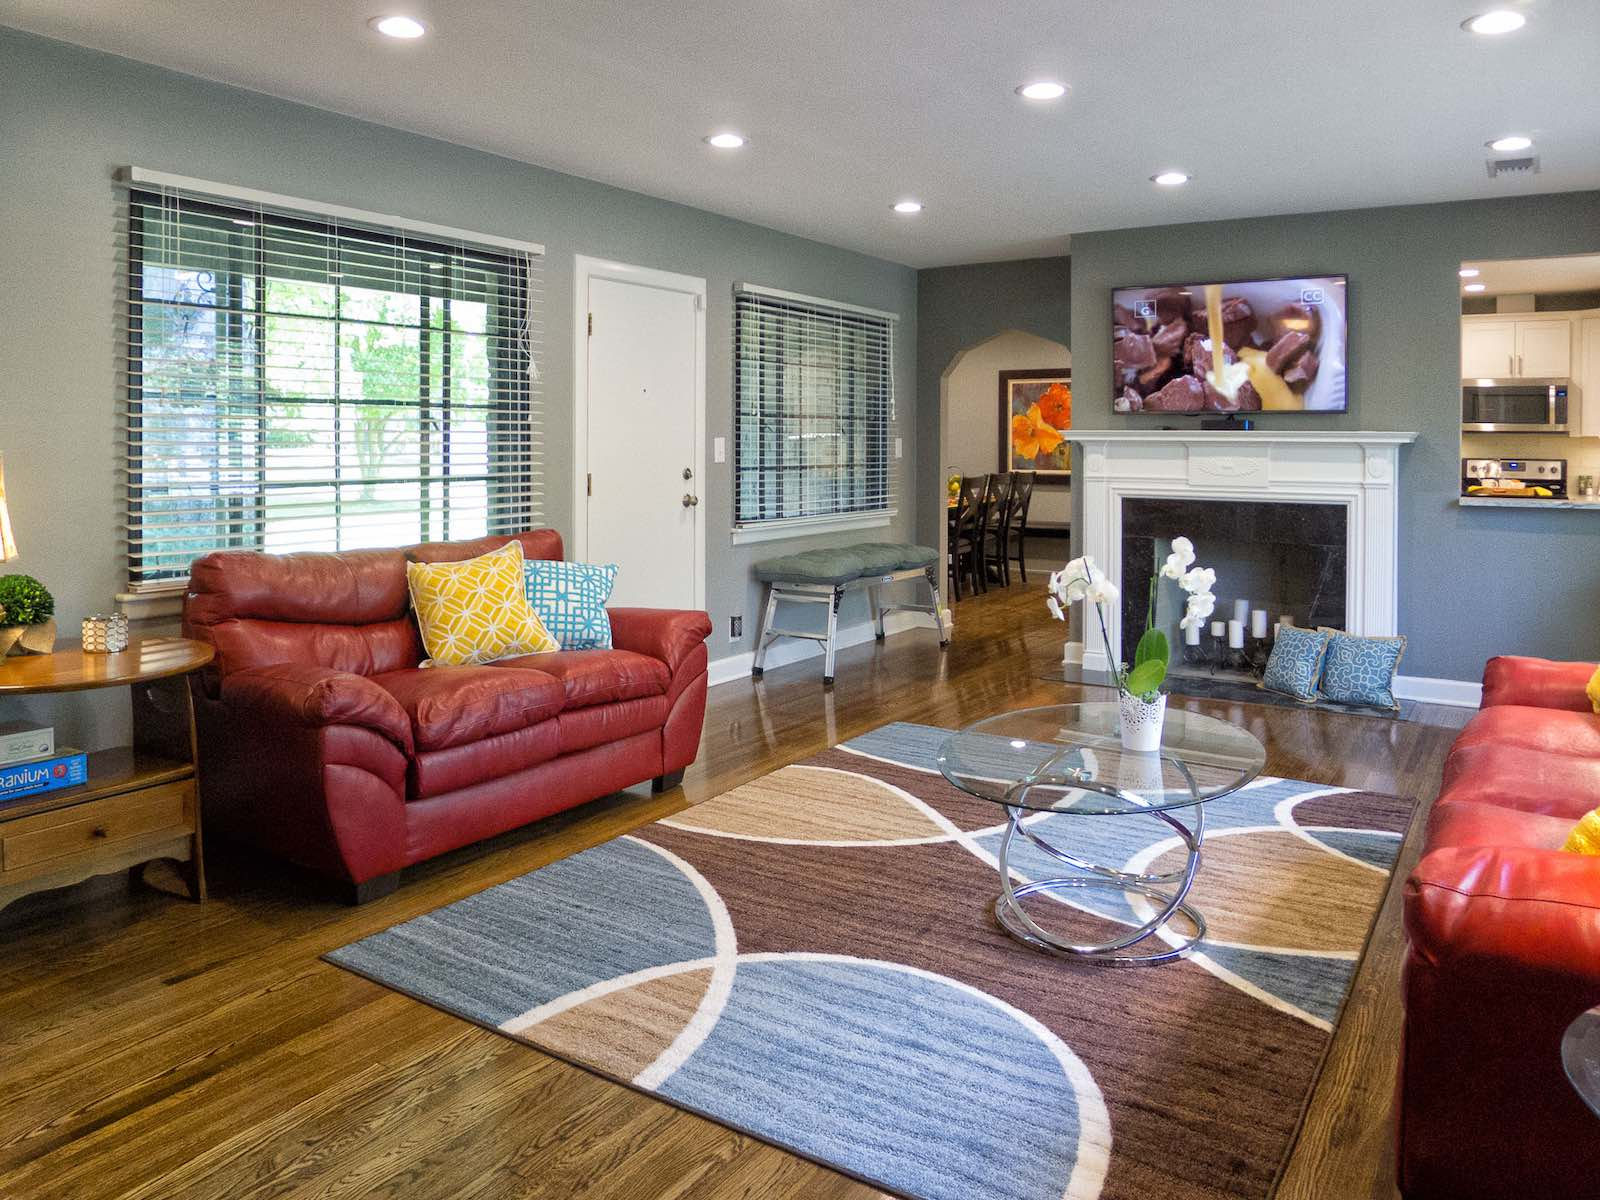 livingroom3Small.jpg